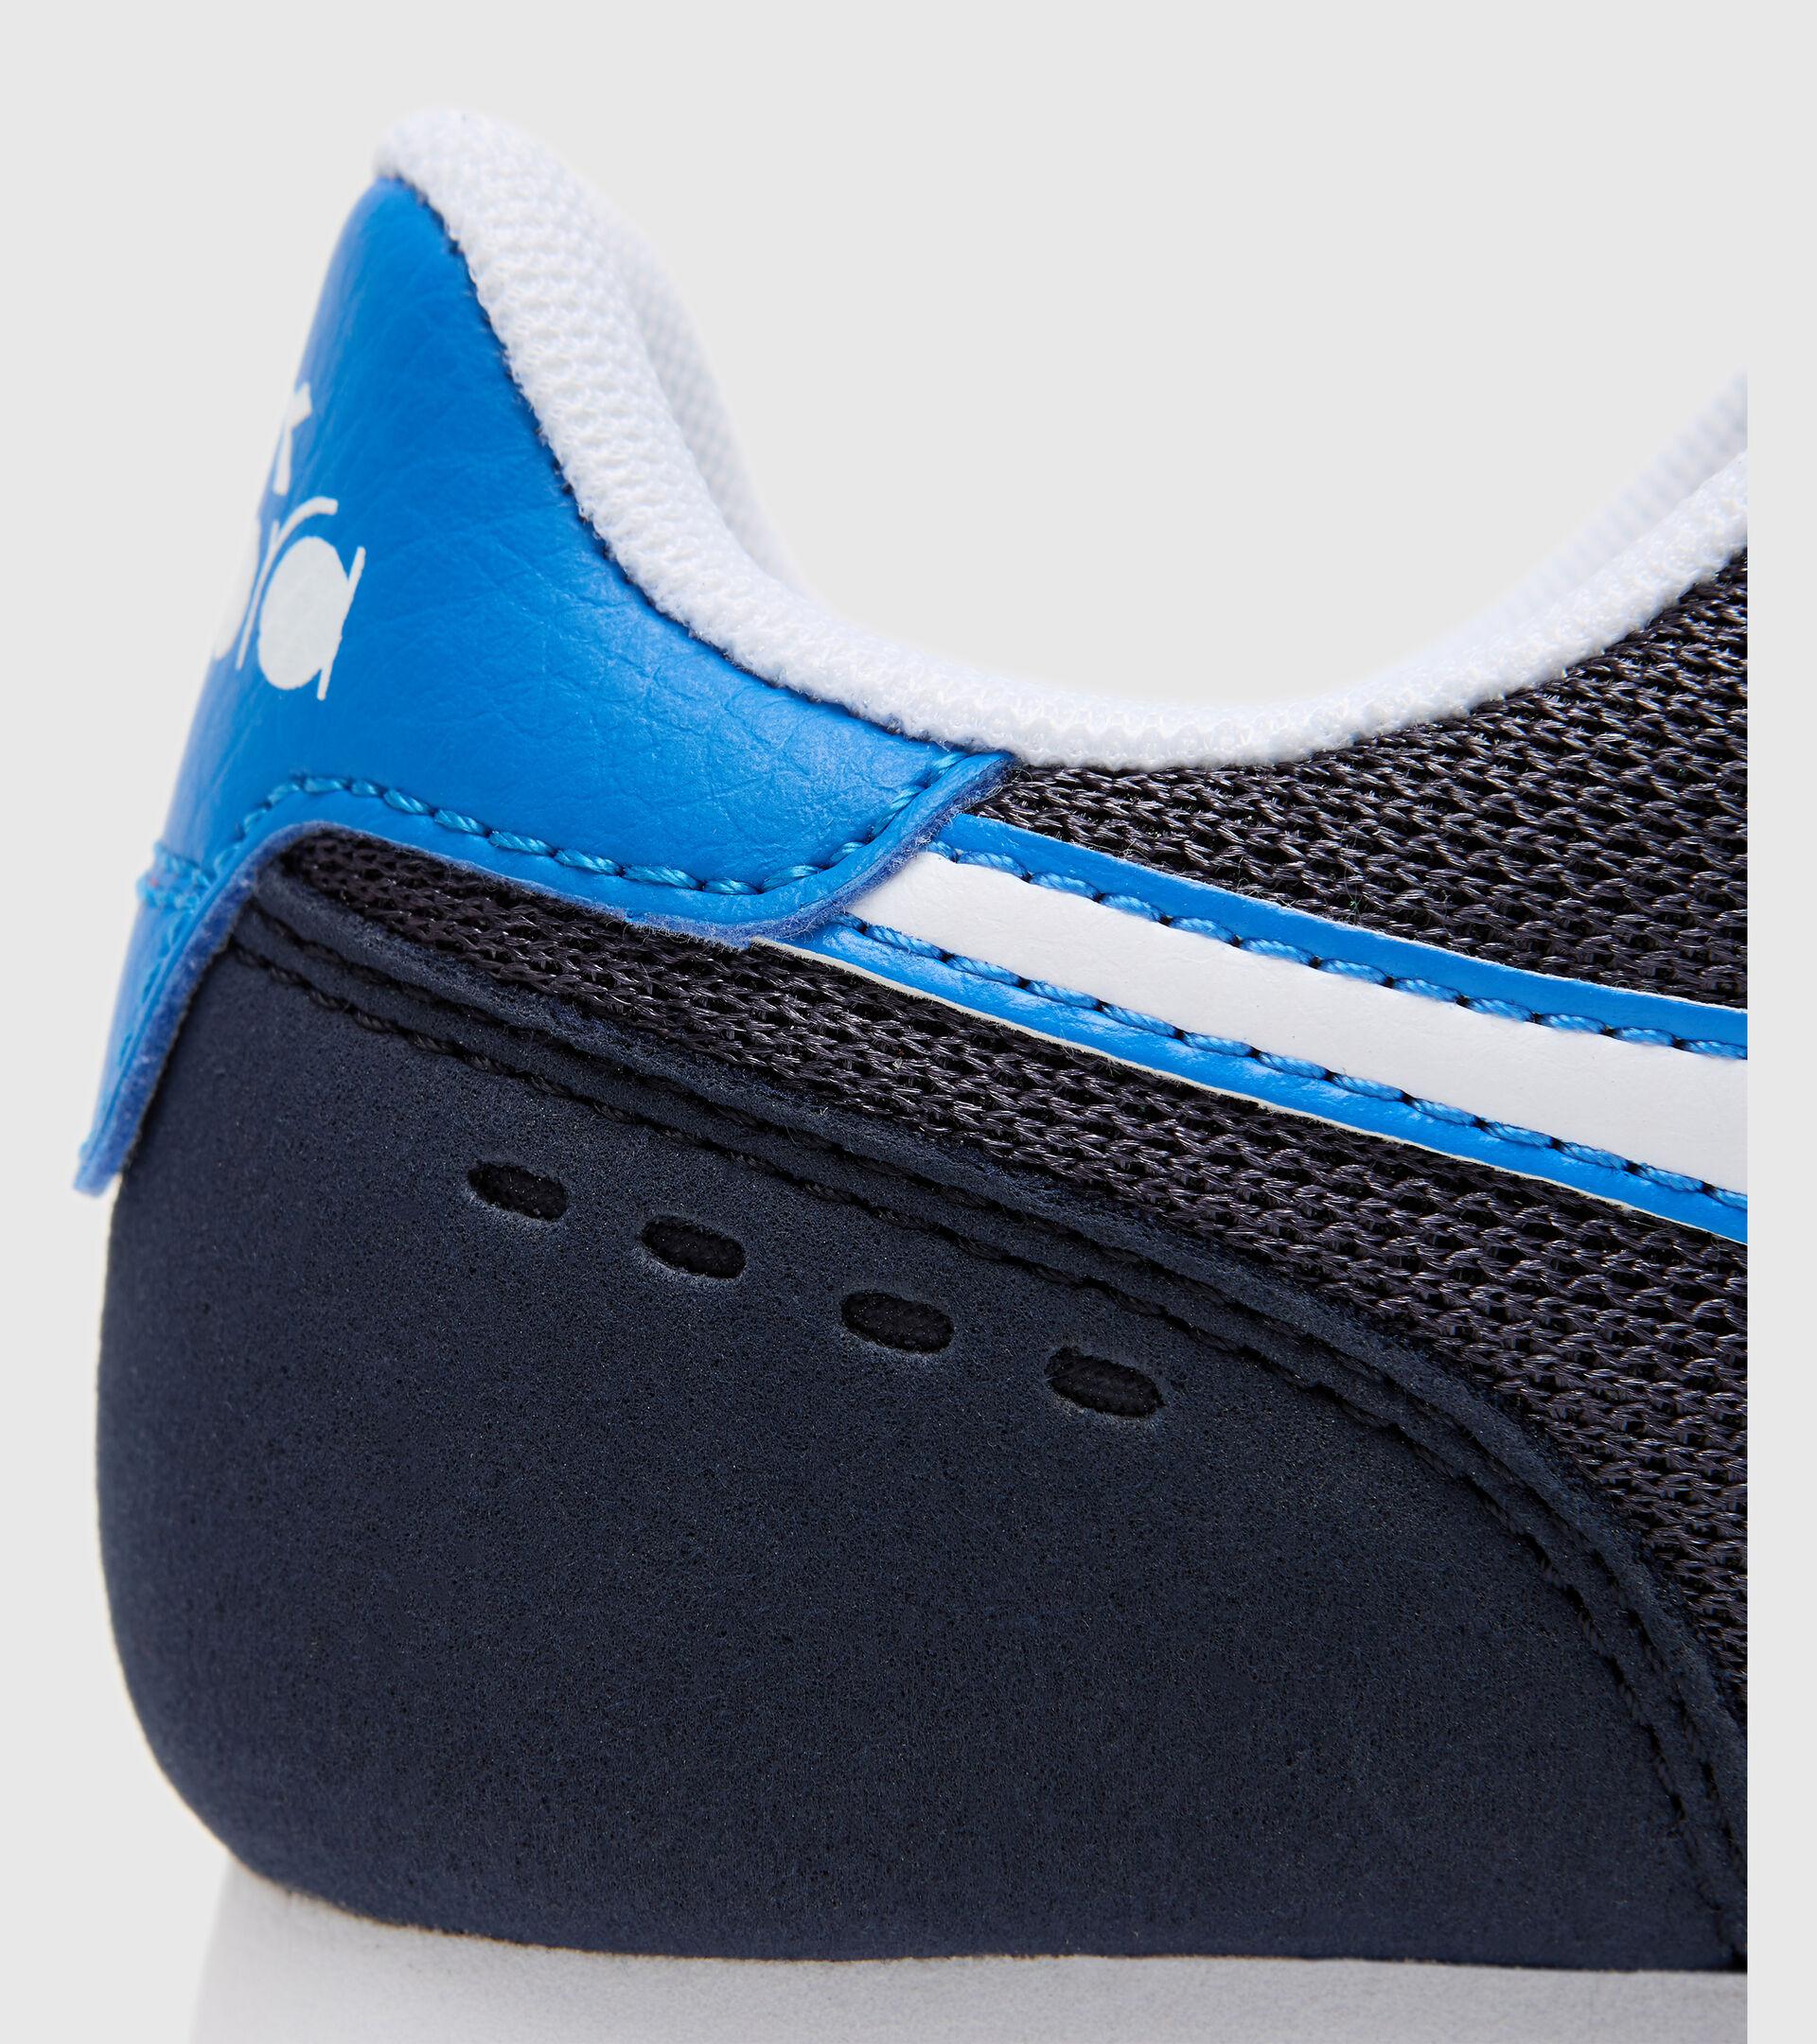 Footwear Sport BAMBINO SIMPLE RUN PS BLU CORSARO Diadora